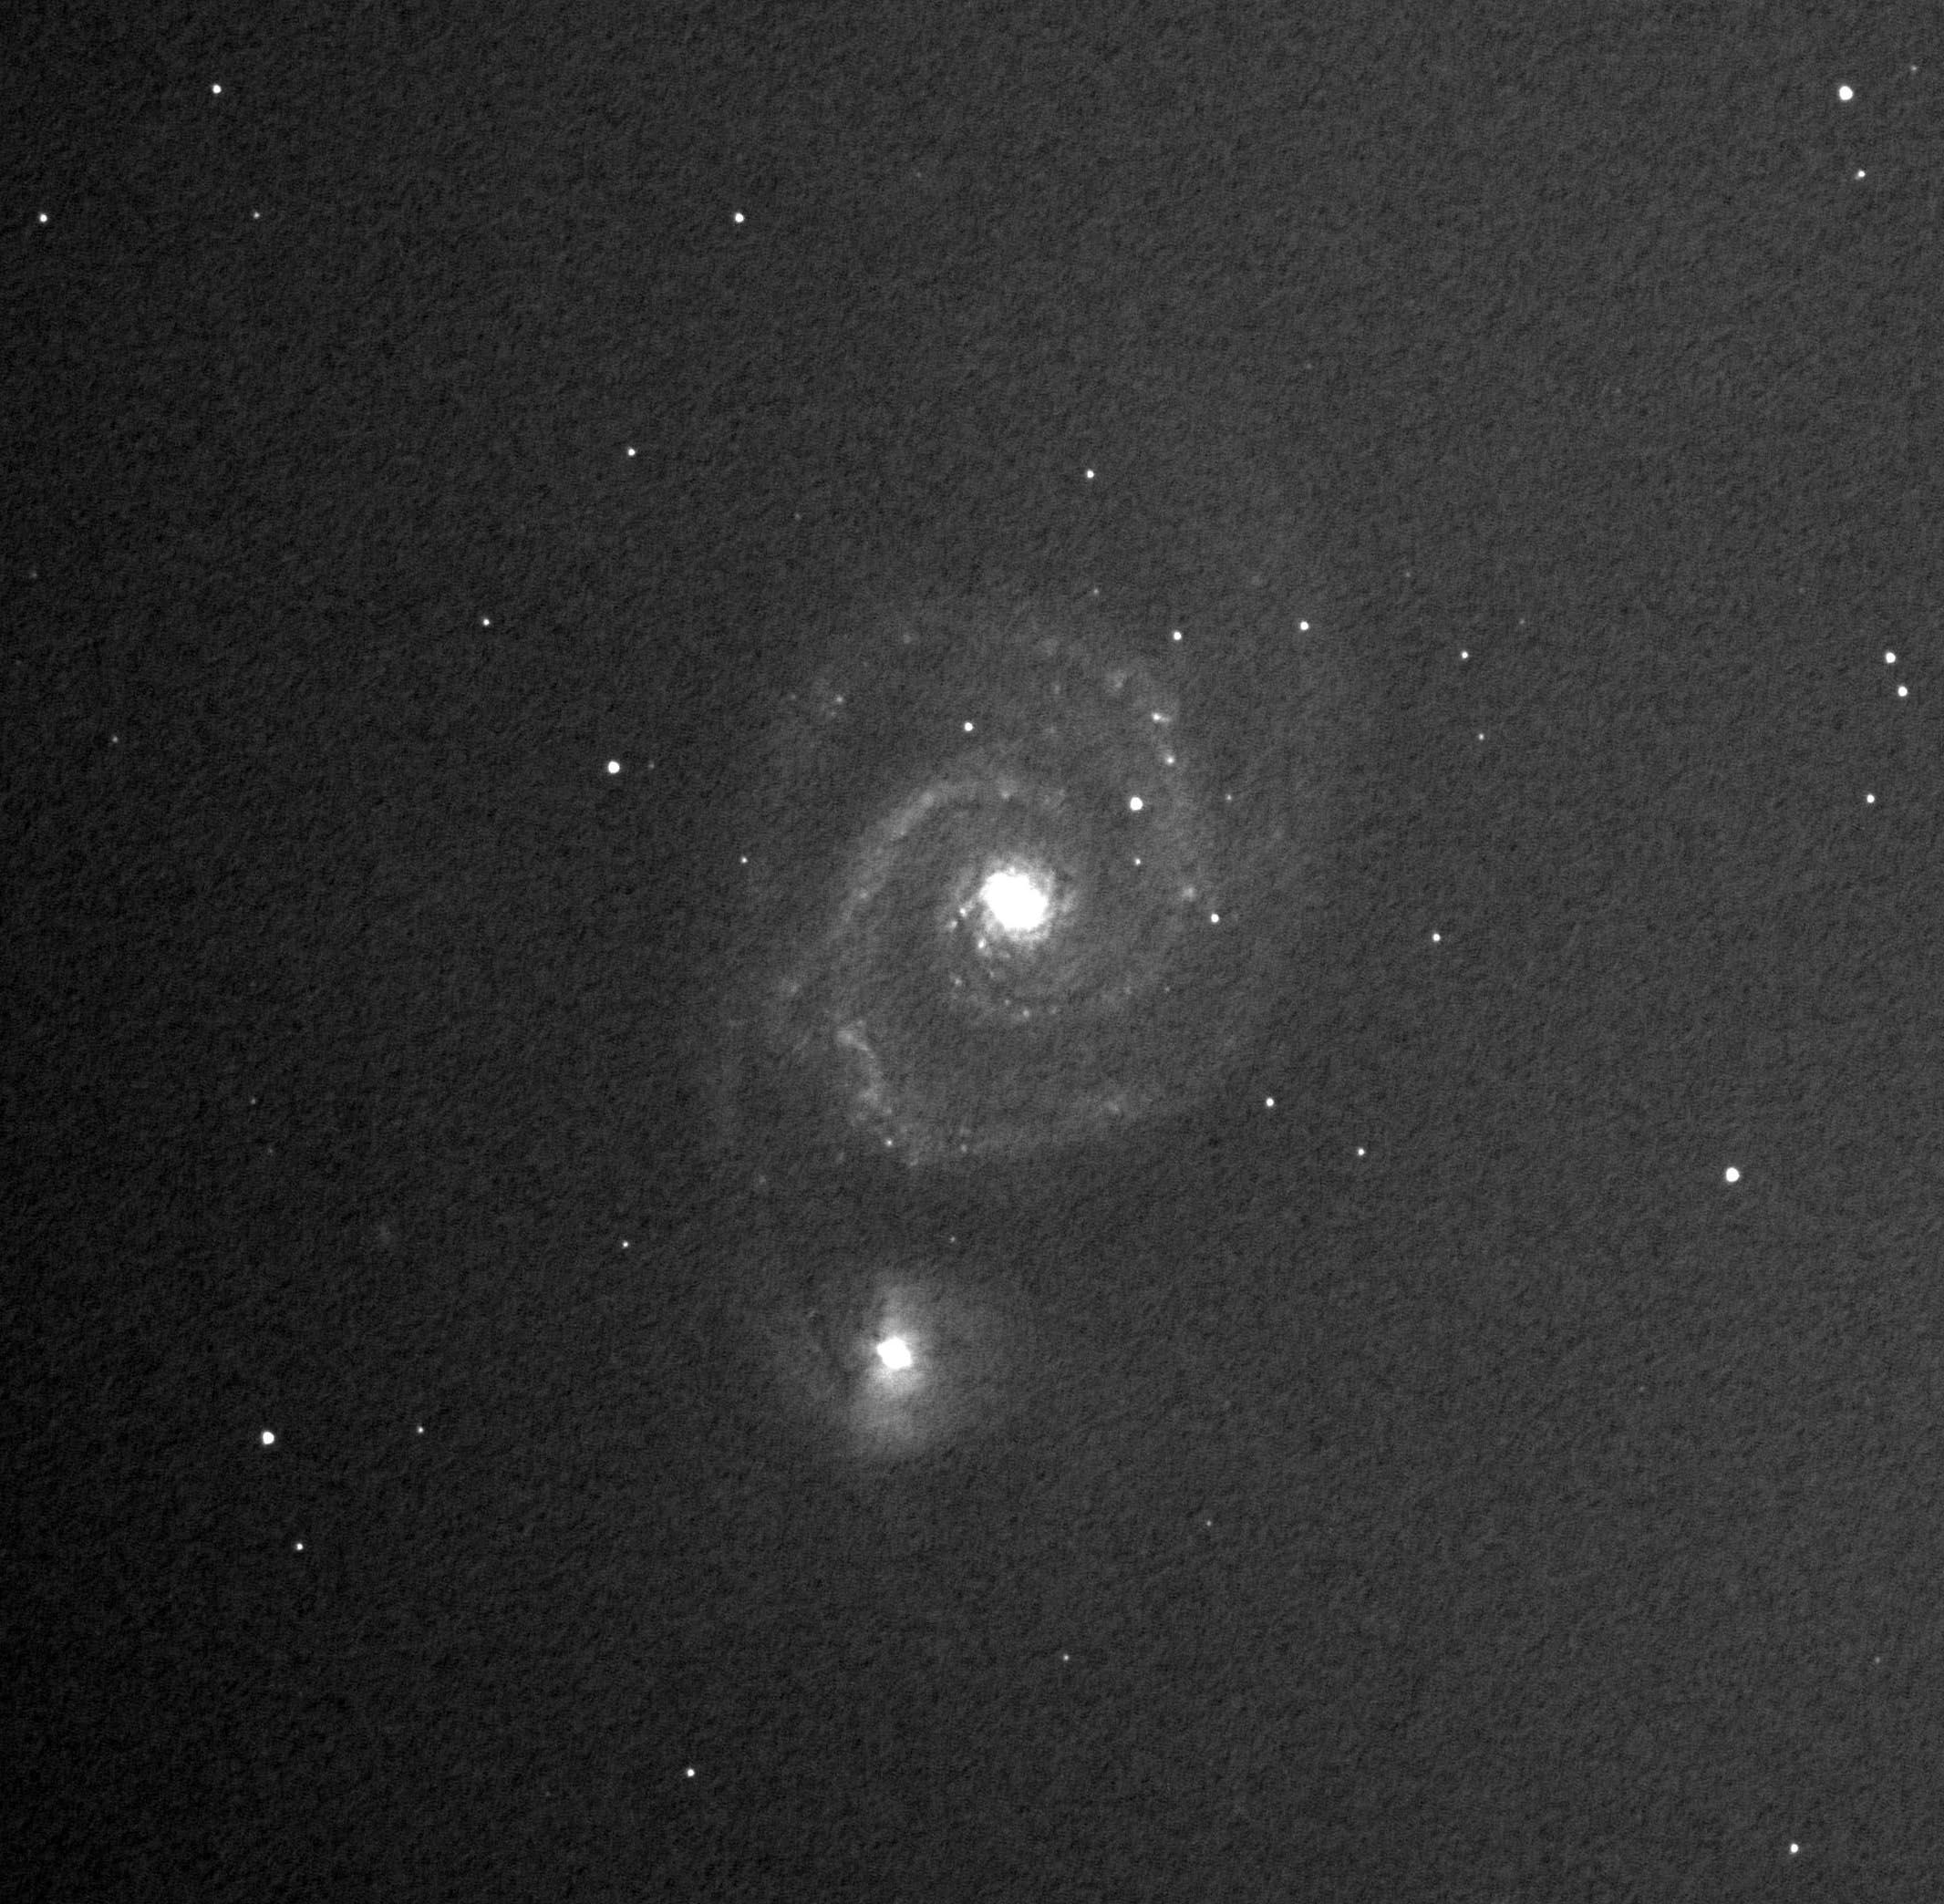 m51-600x1s-p.jpg